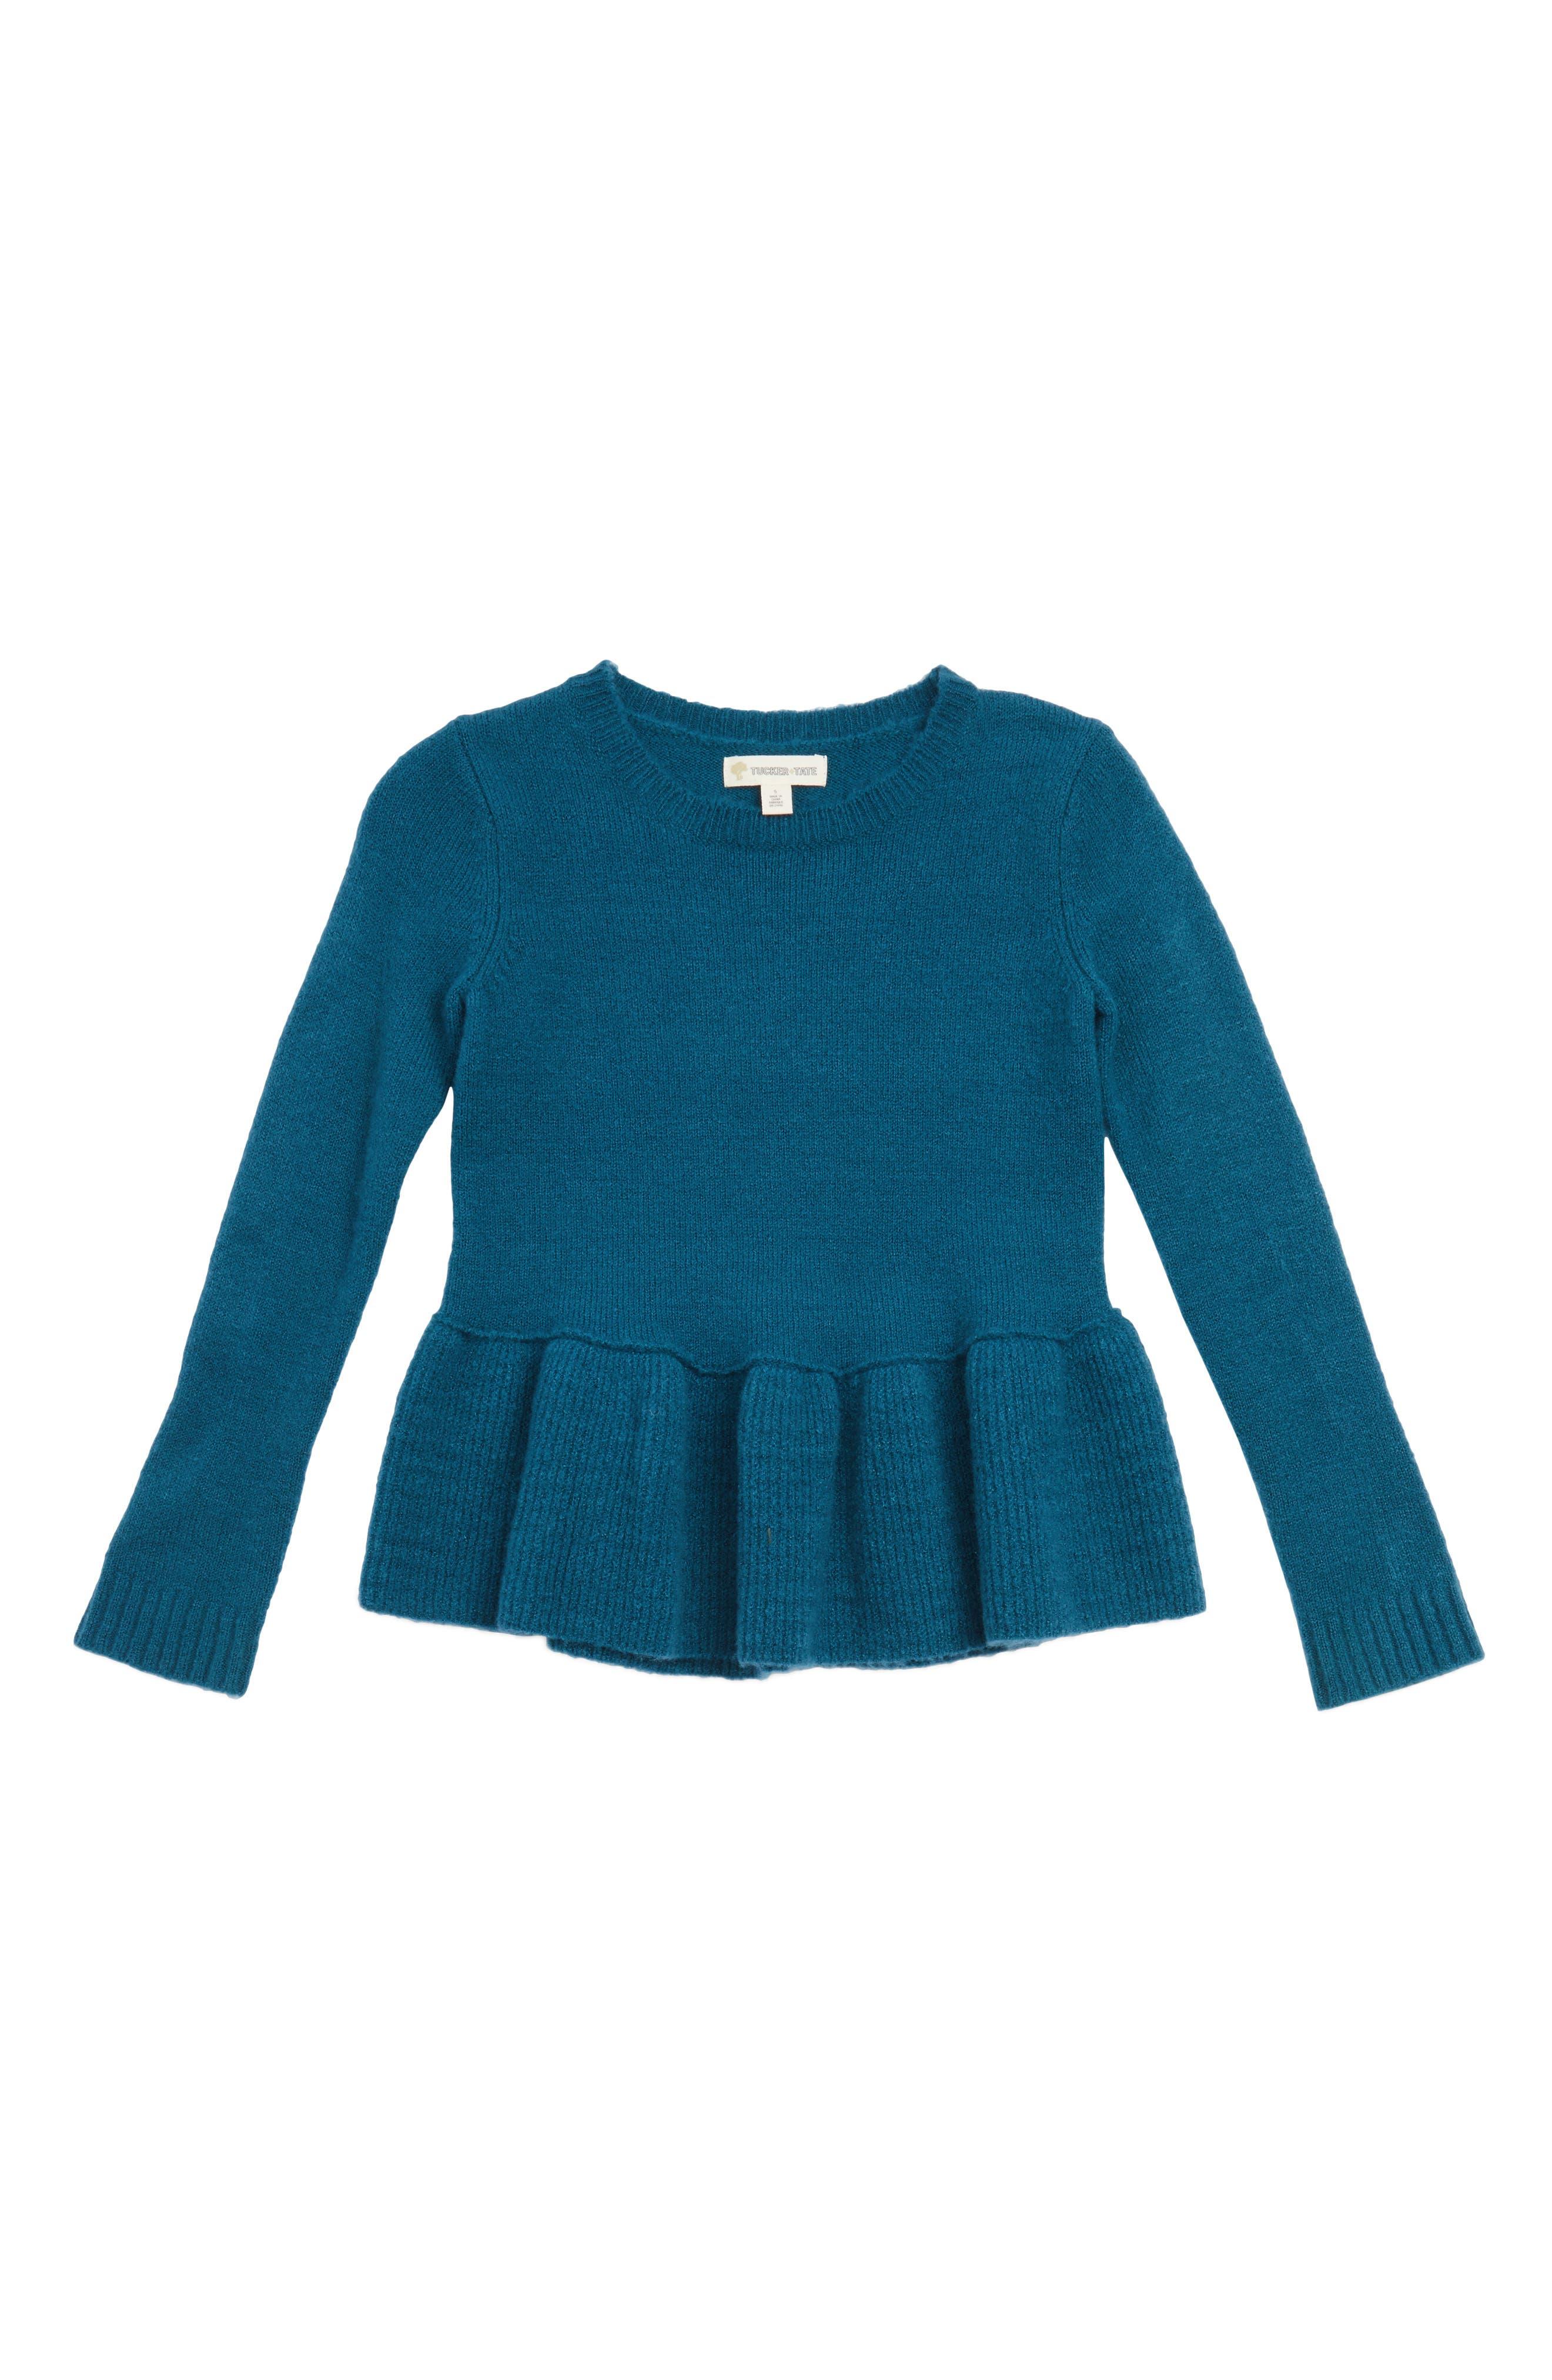 Ruffle Hem Sweater,                         Main,                         color, Teal Coral